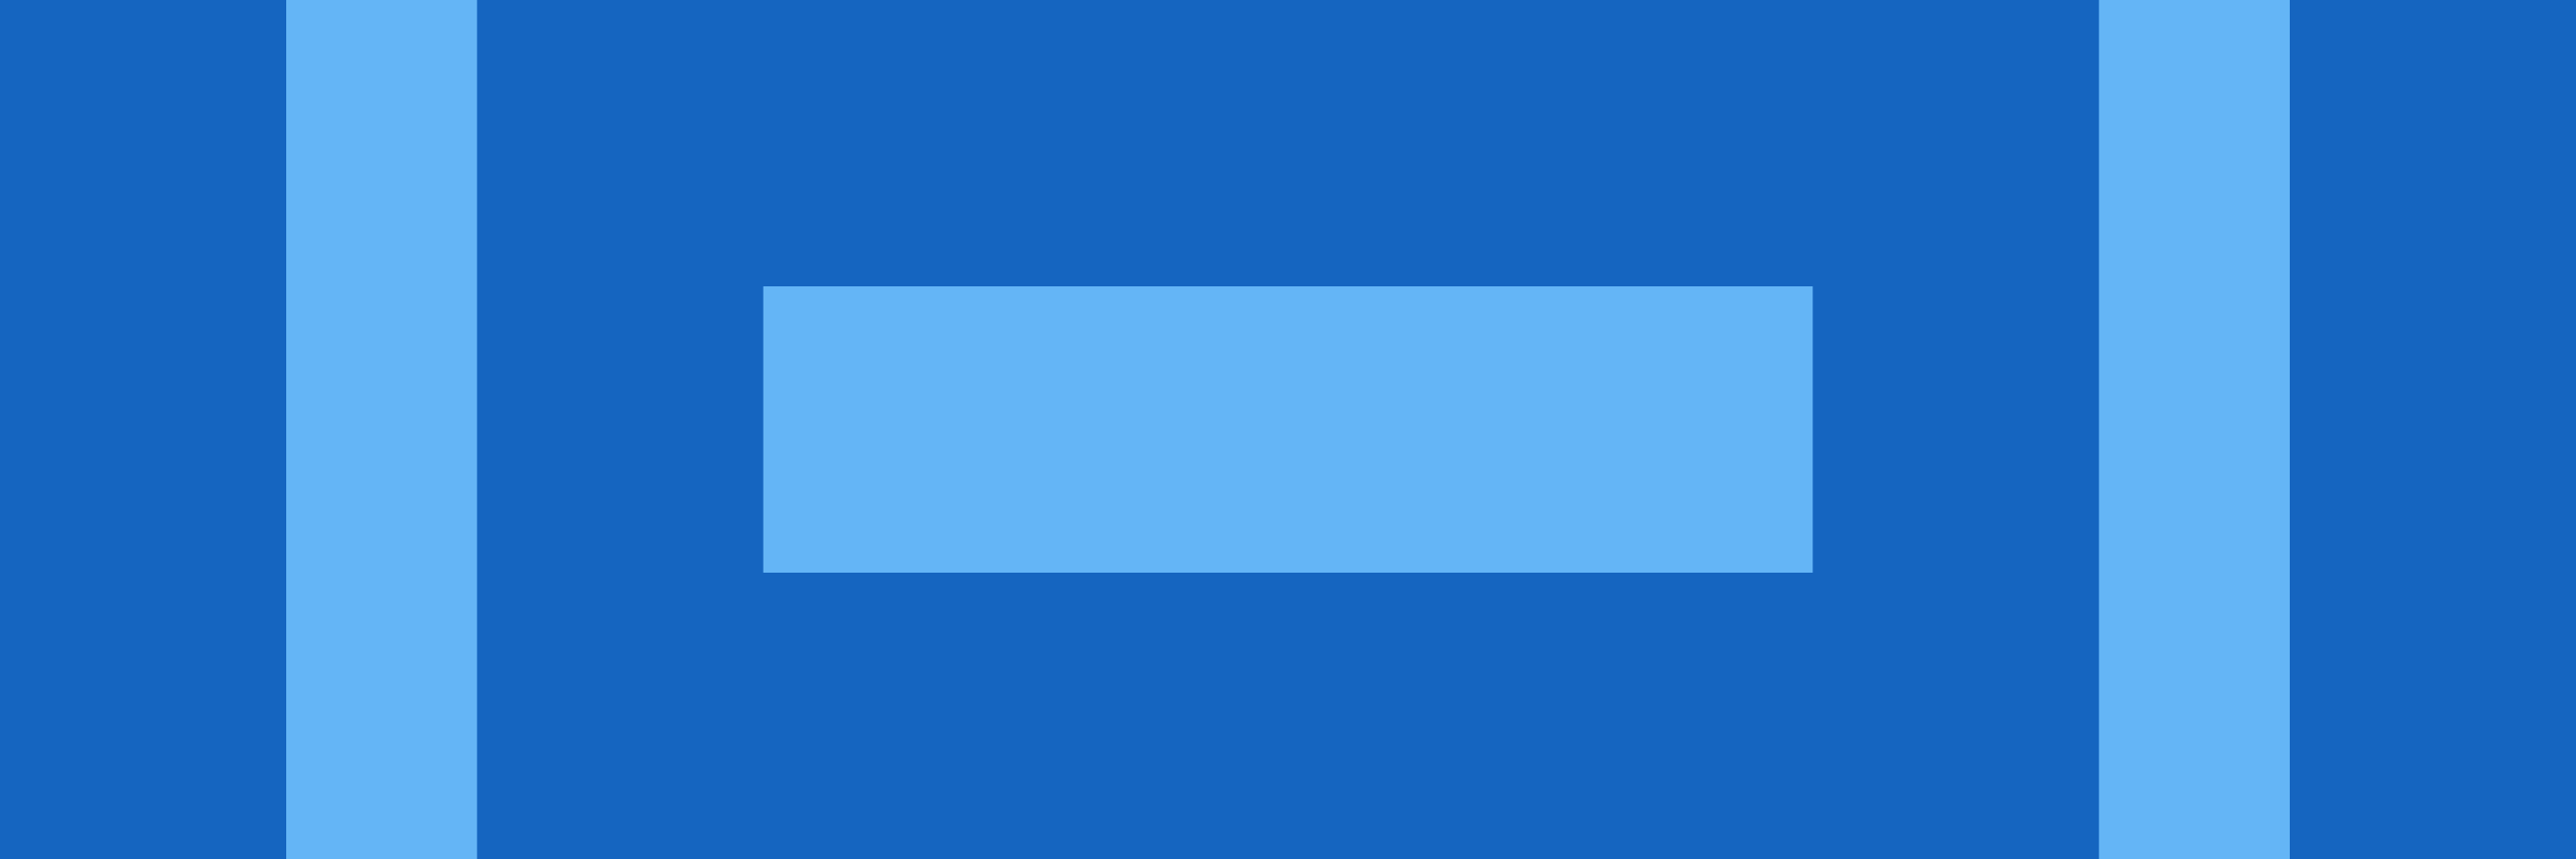 book blue Clipart illustration in PNG, SVG